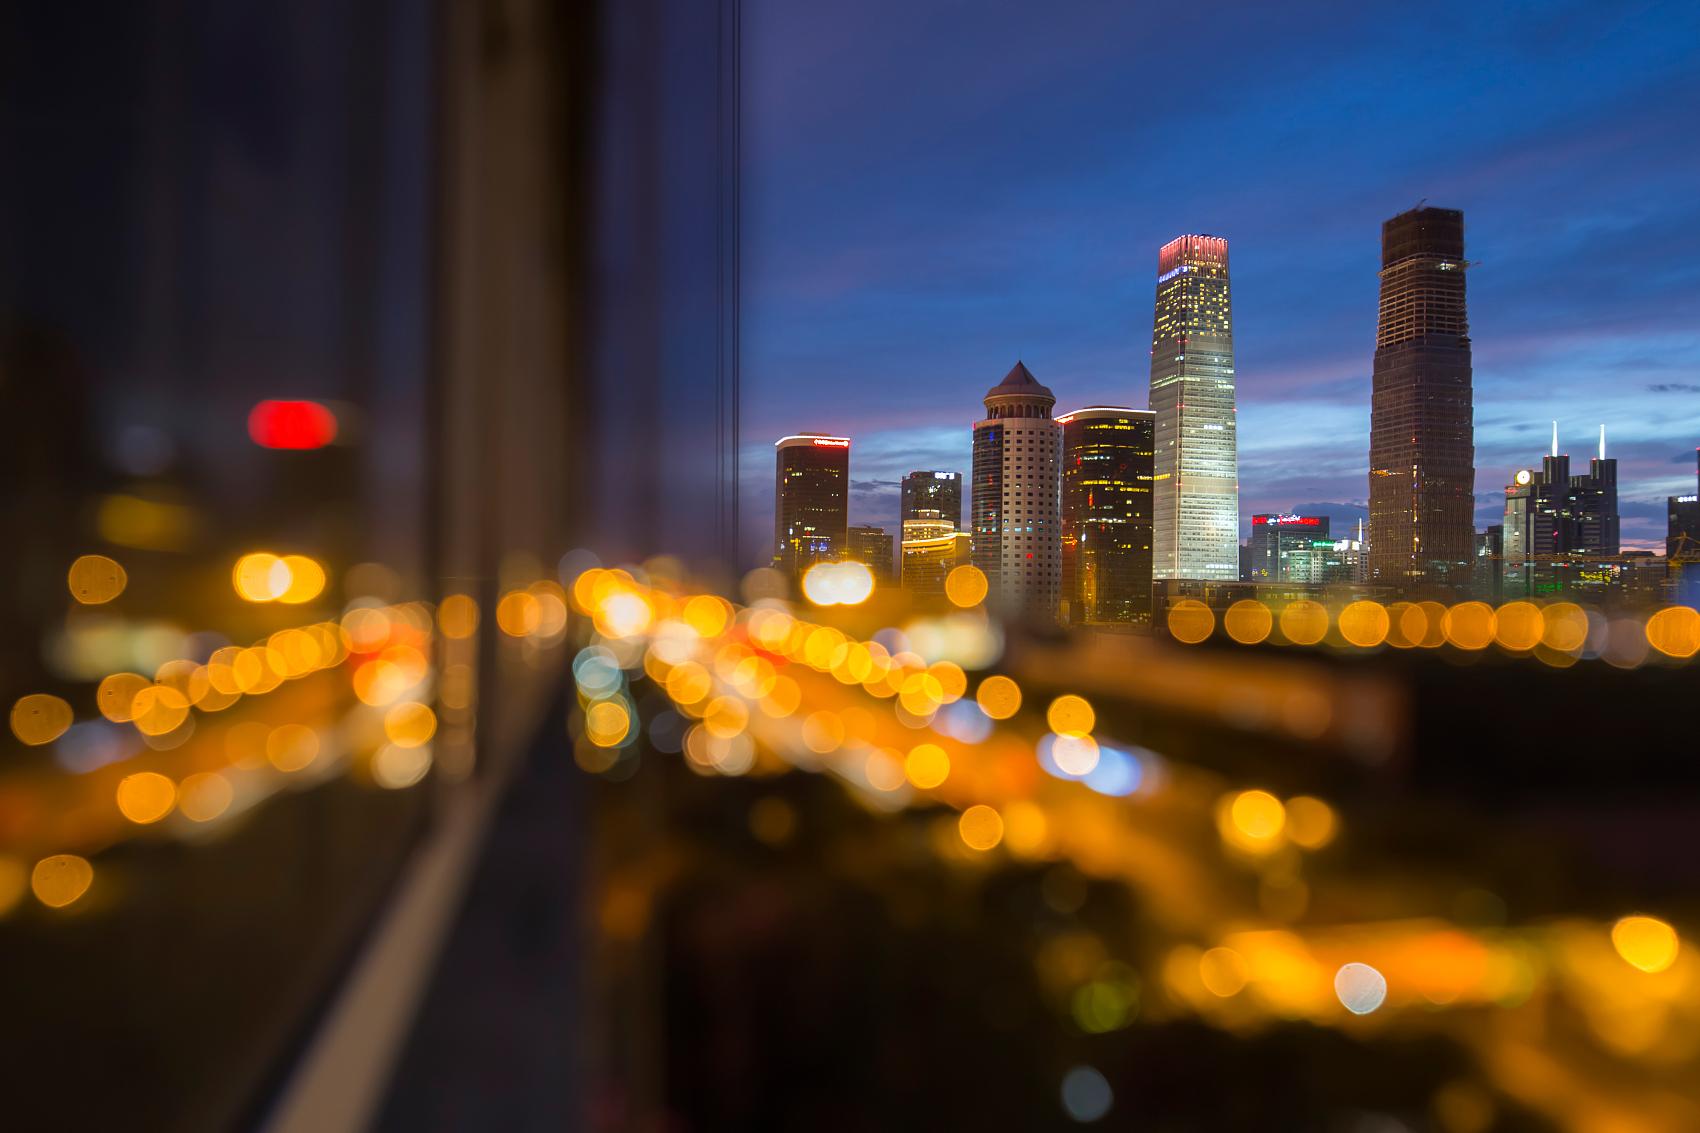 OECD cuts 2020 global growth forecast